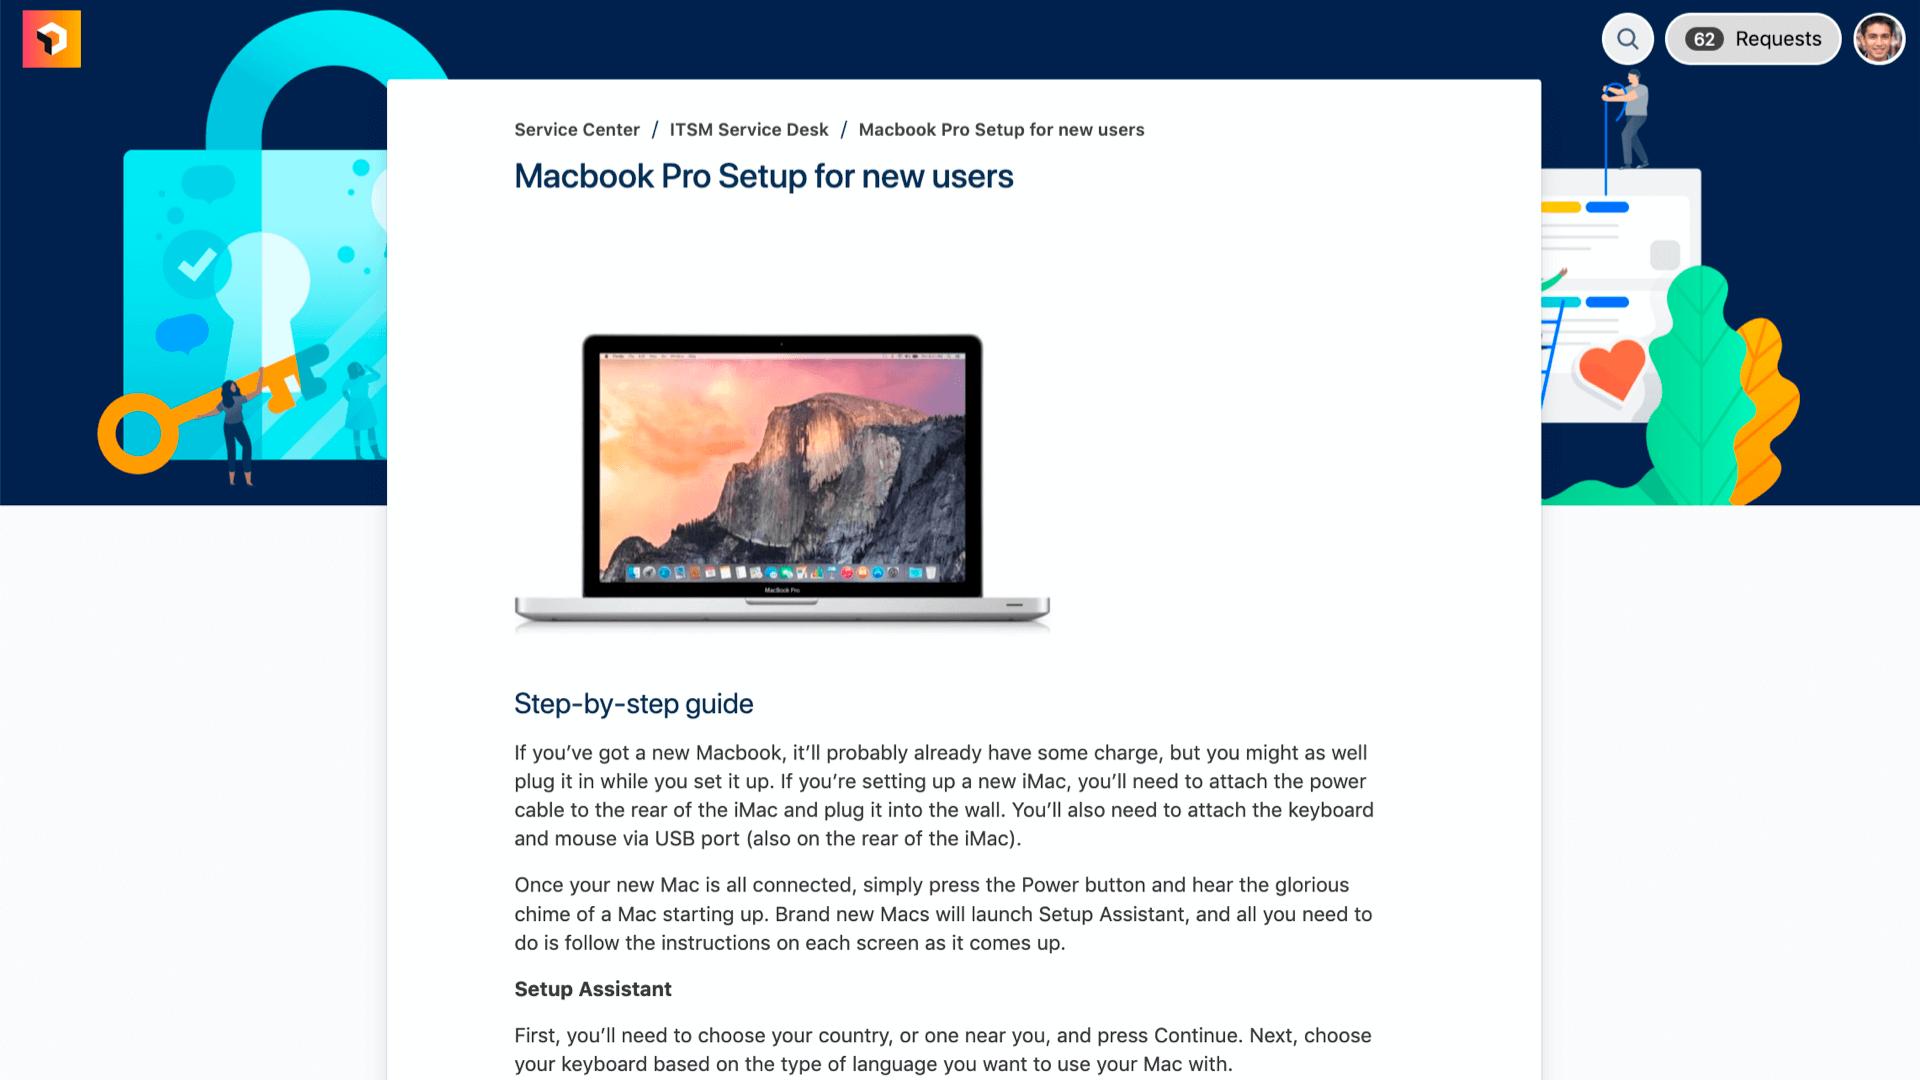 Servicedesk-portal